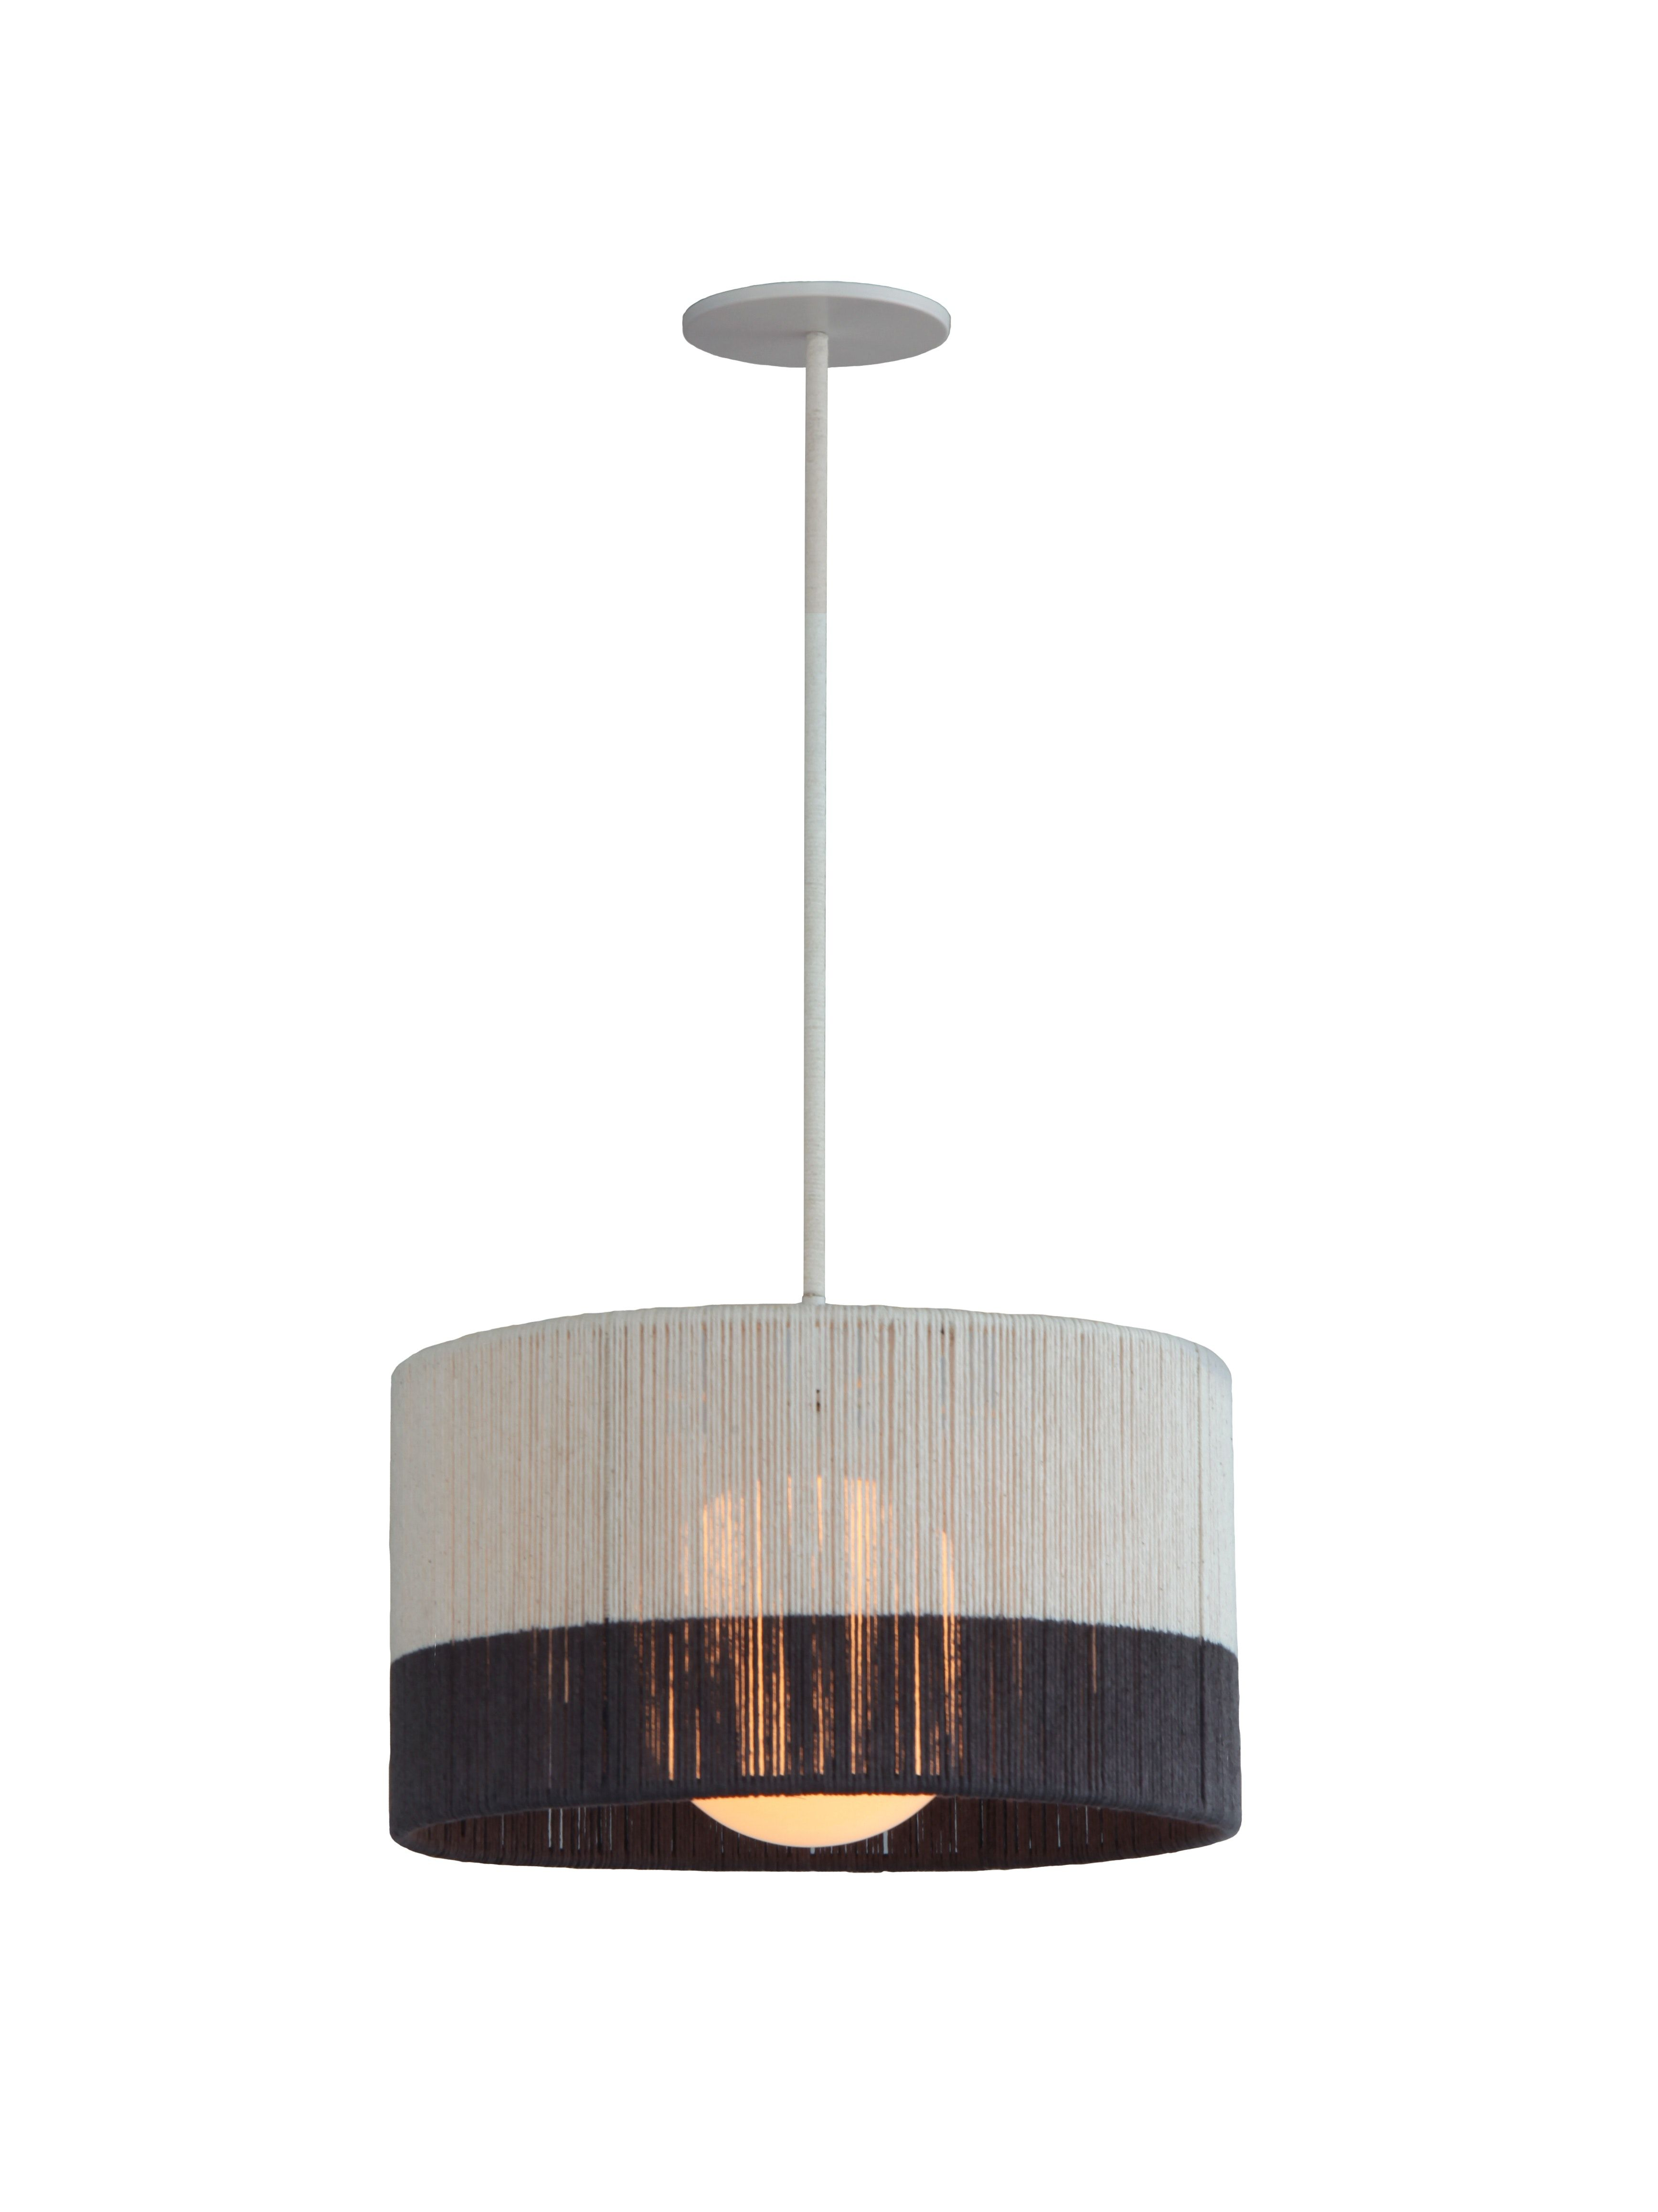 Horizon string drum ceiling fixture by bone simple design price on request